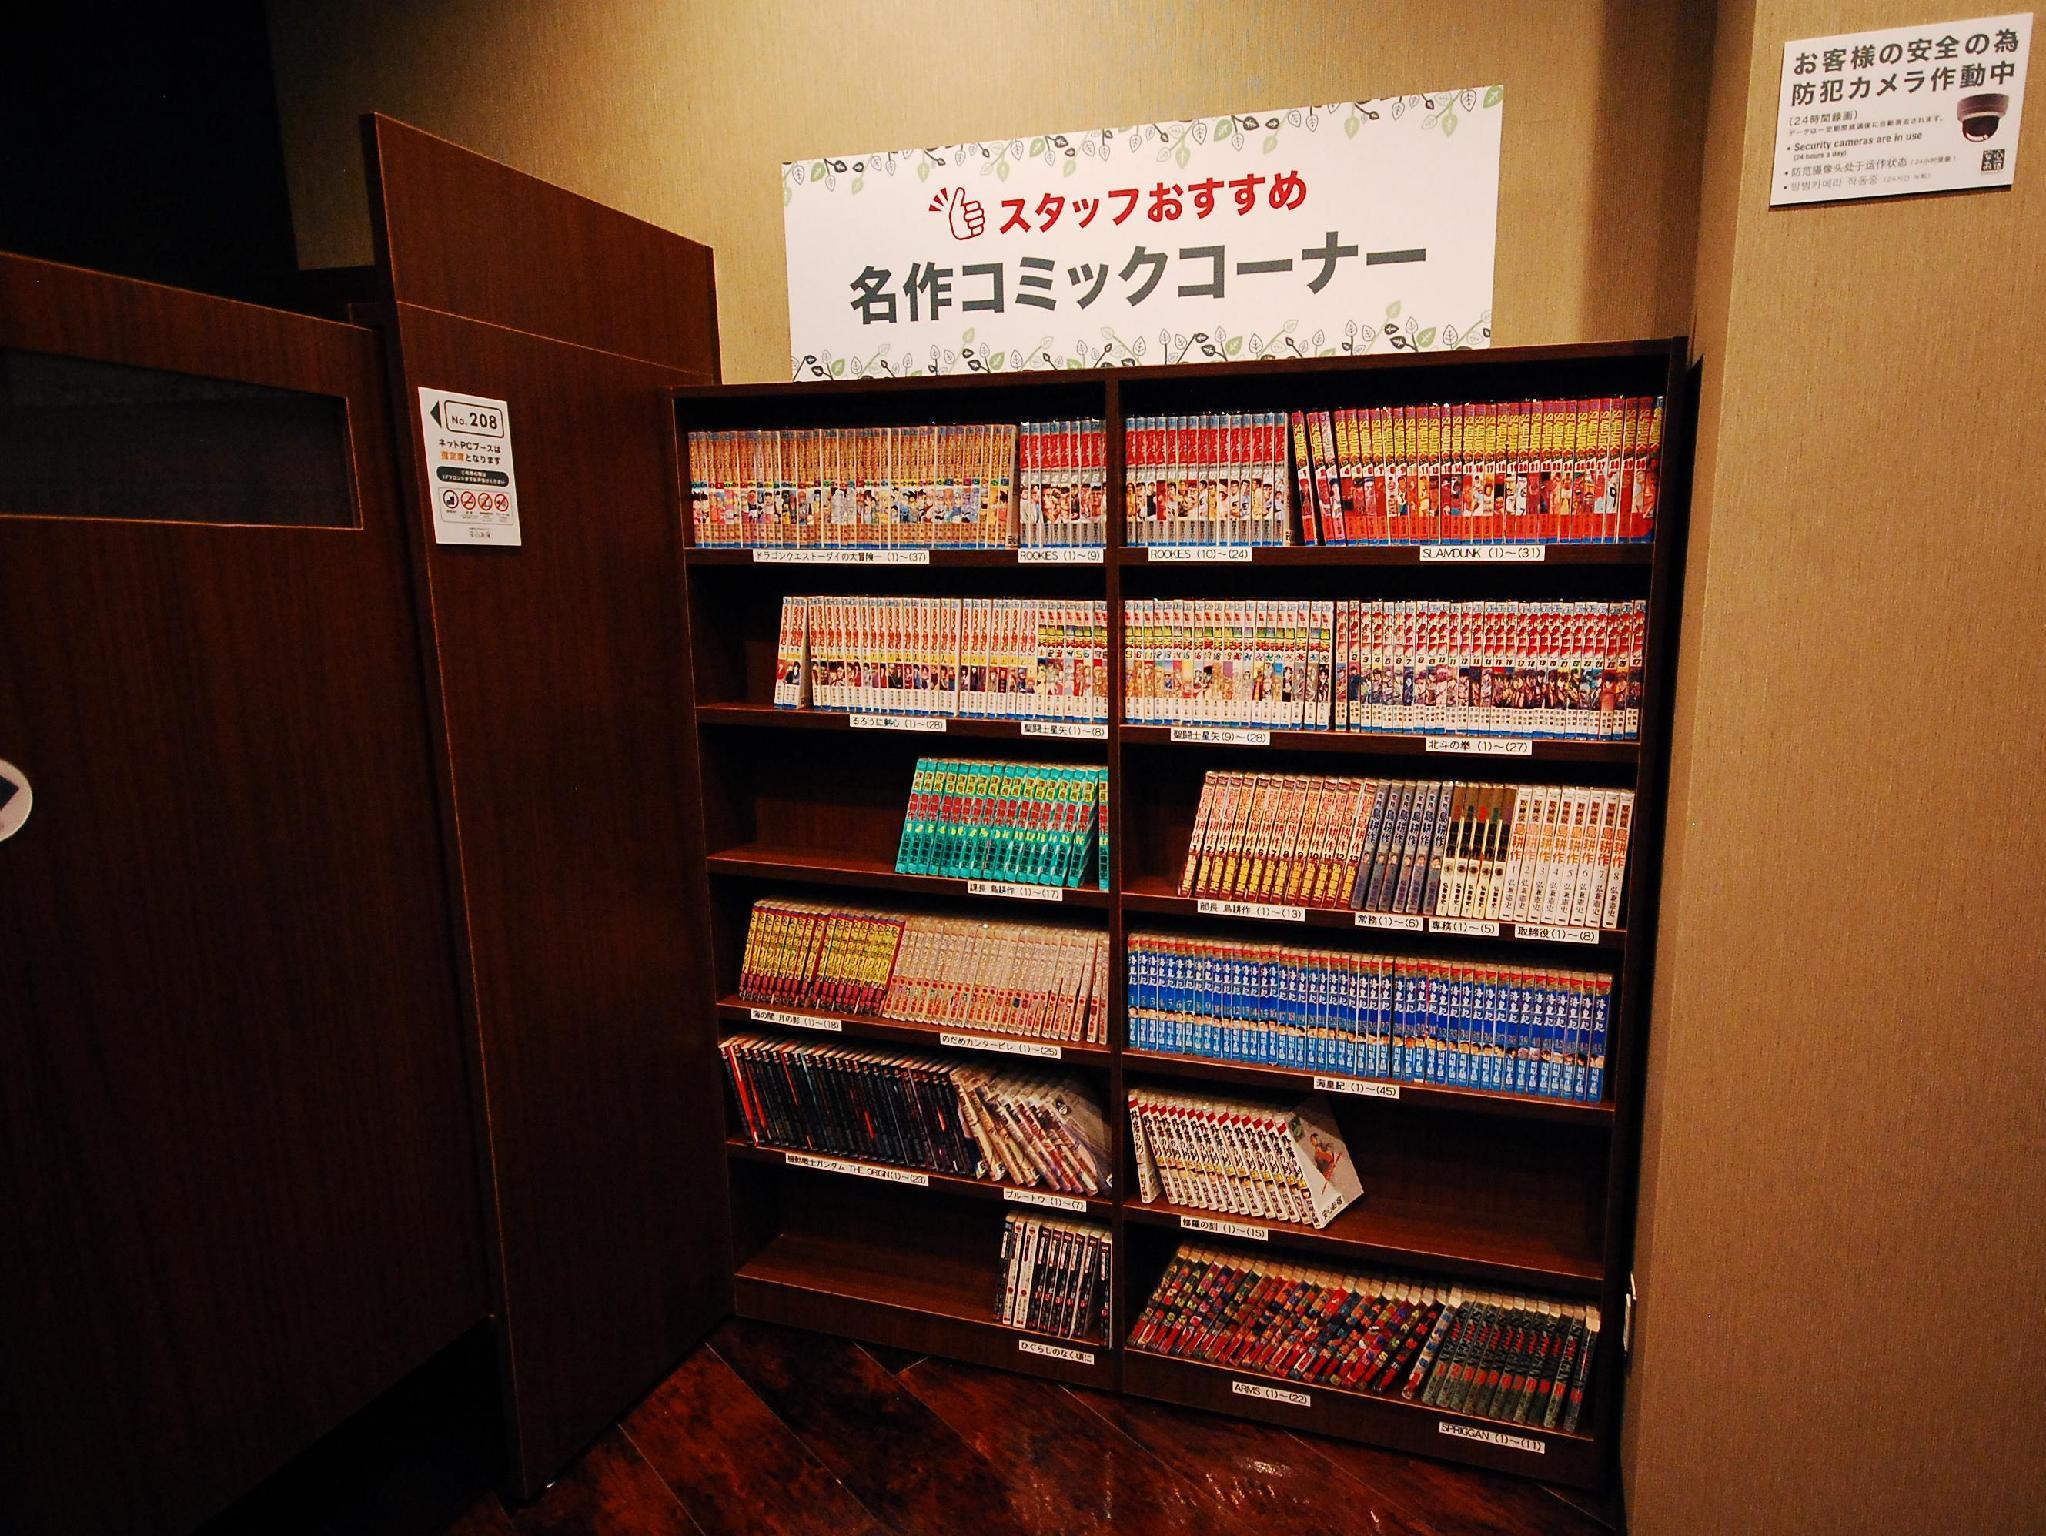 Anshin Oyado Premier Tokyo Capsule Hotel Shinjuku Station